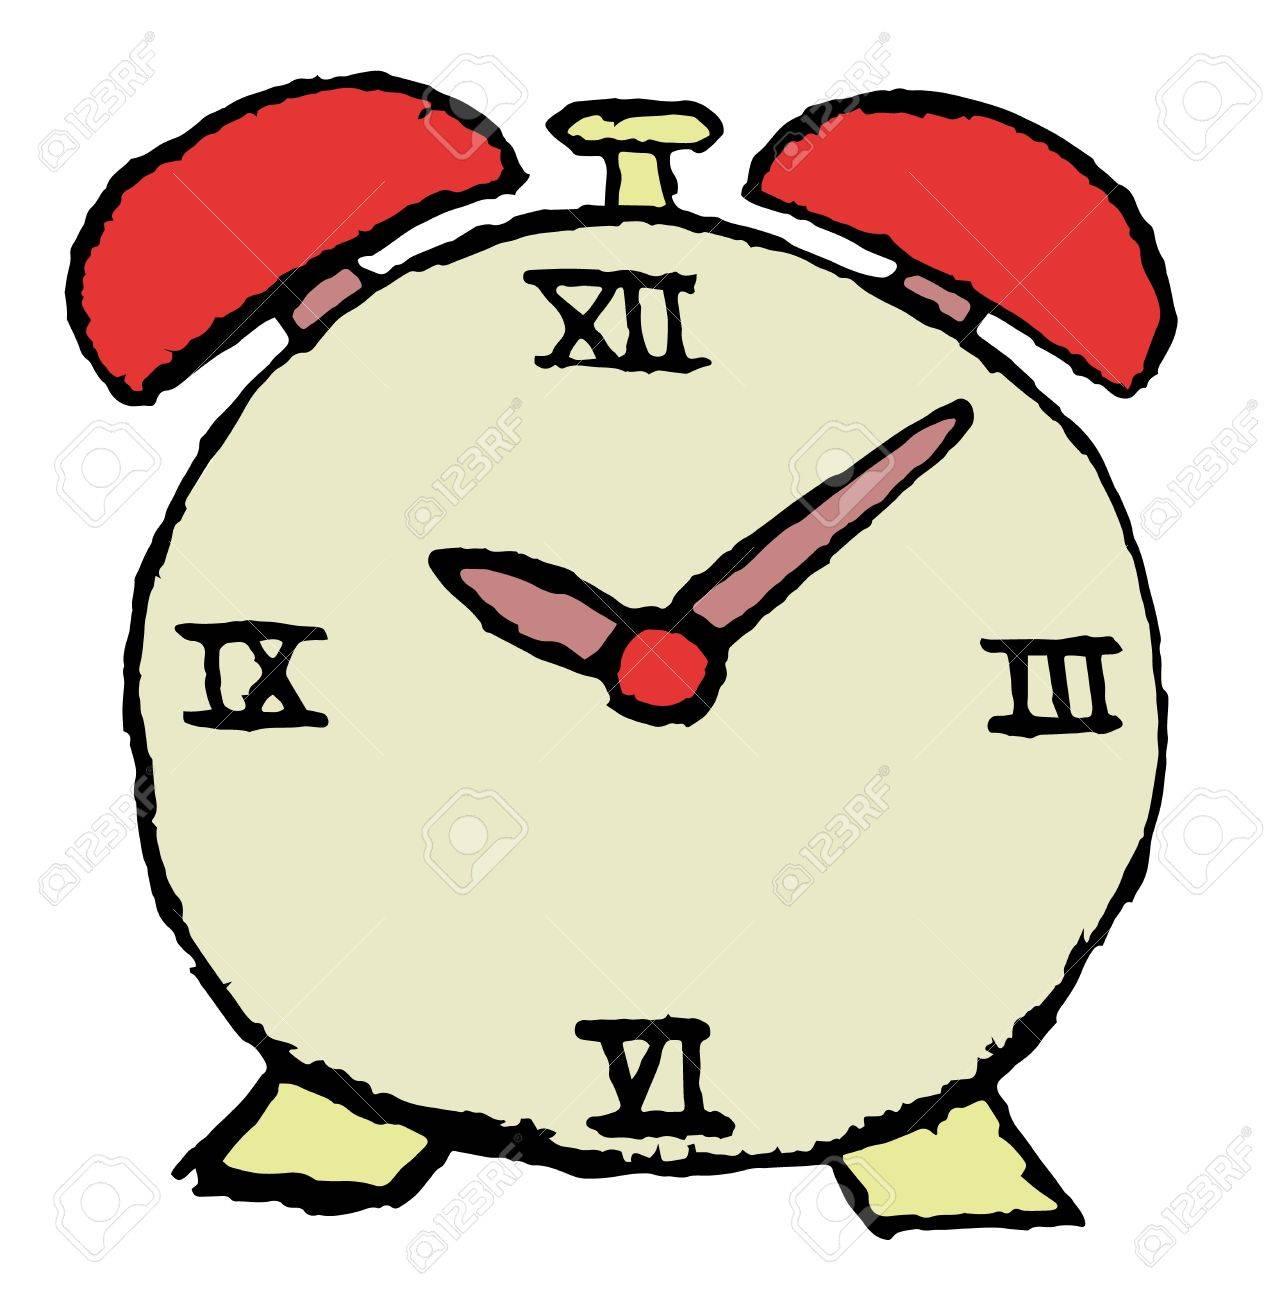 sketch of alarm clock in red color Stock Vector - 17727826